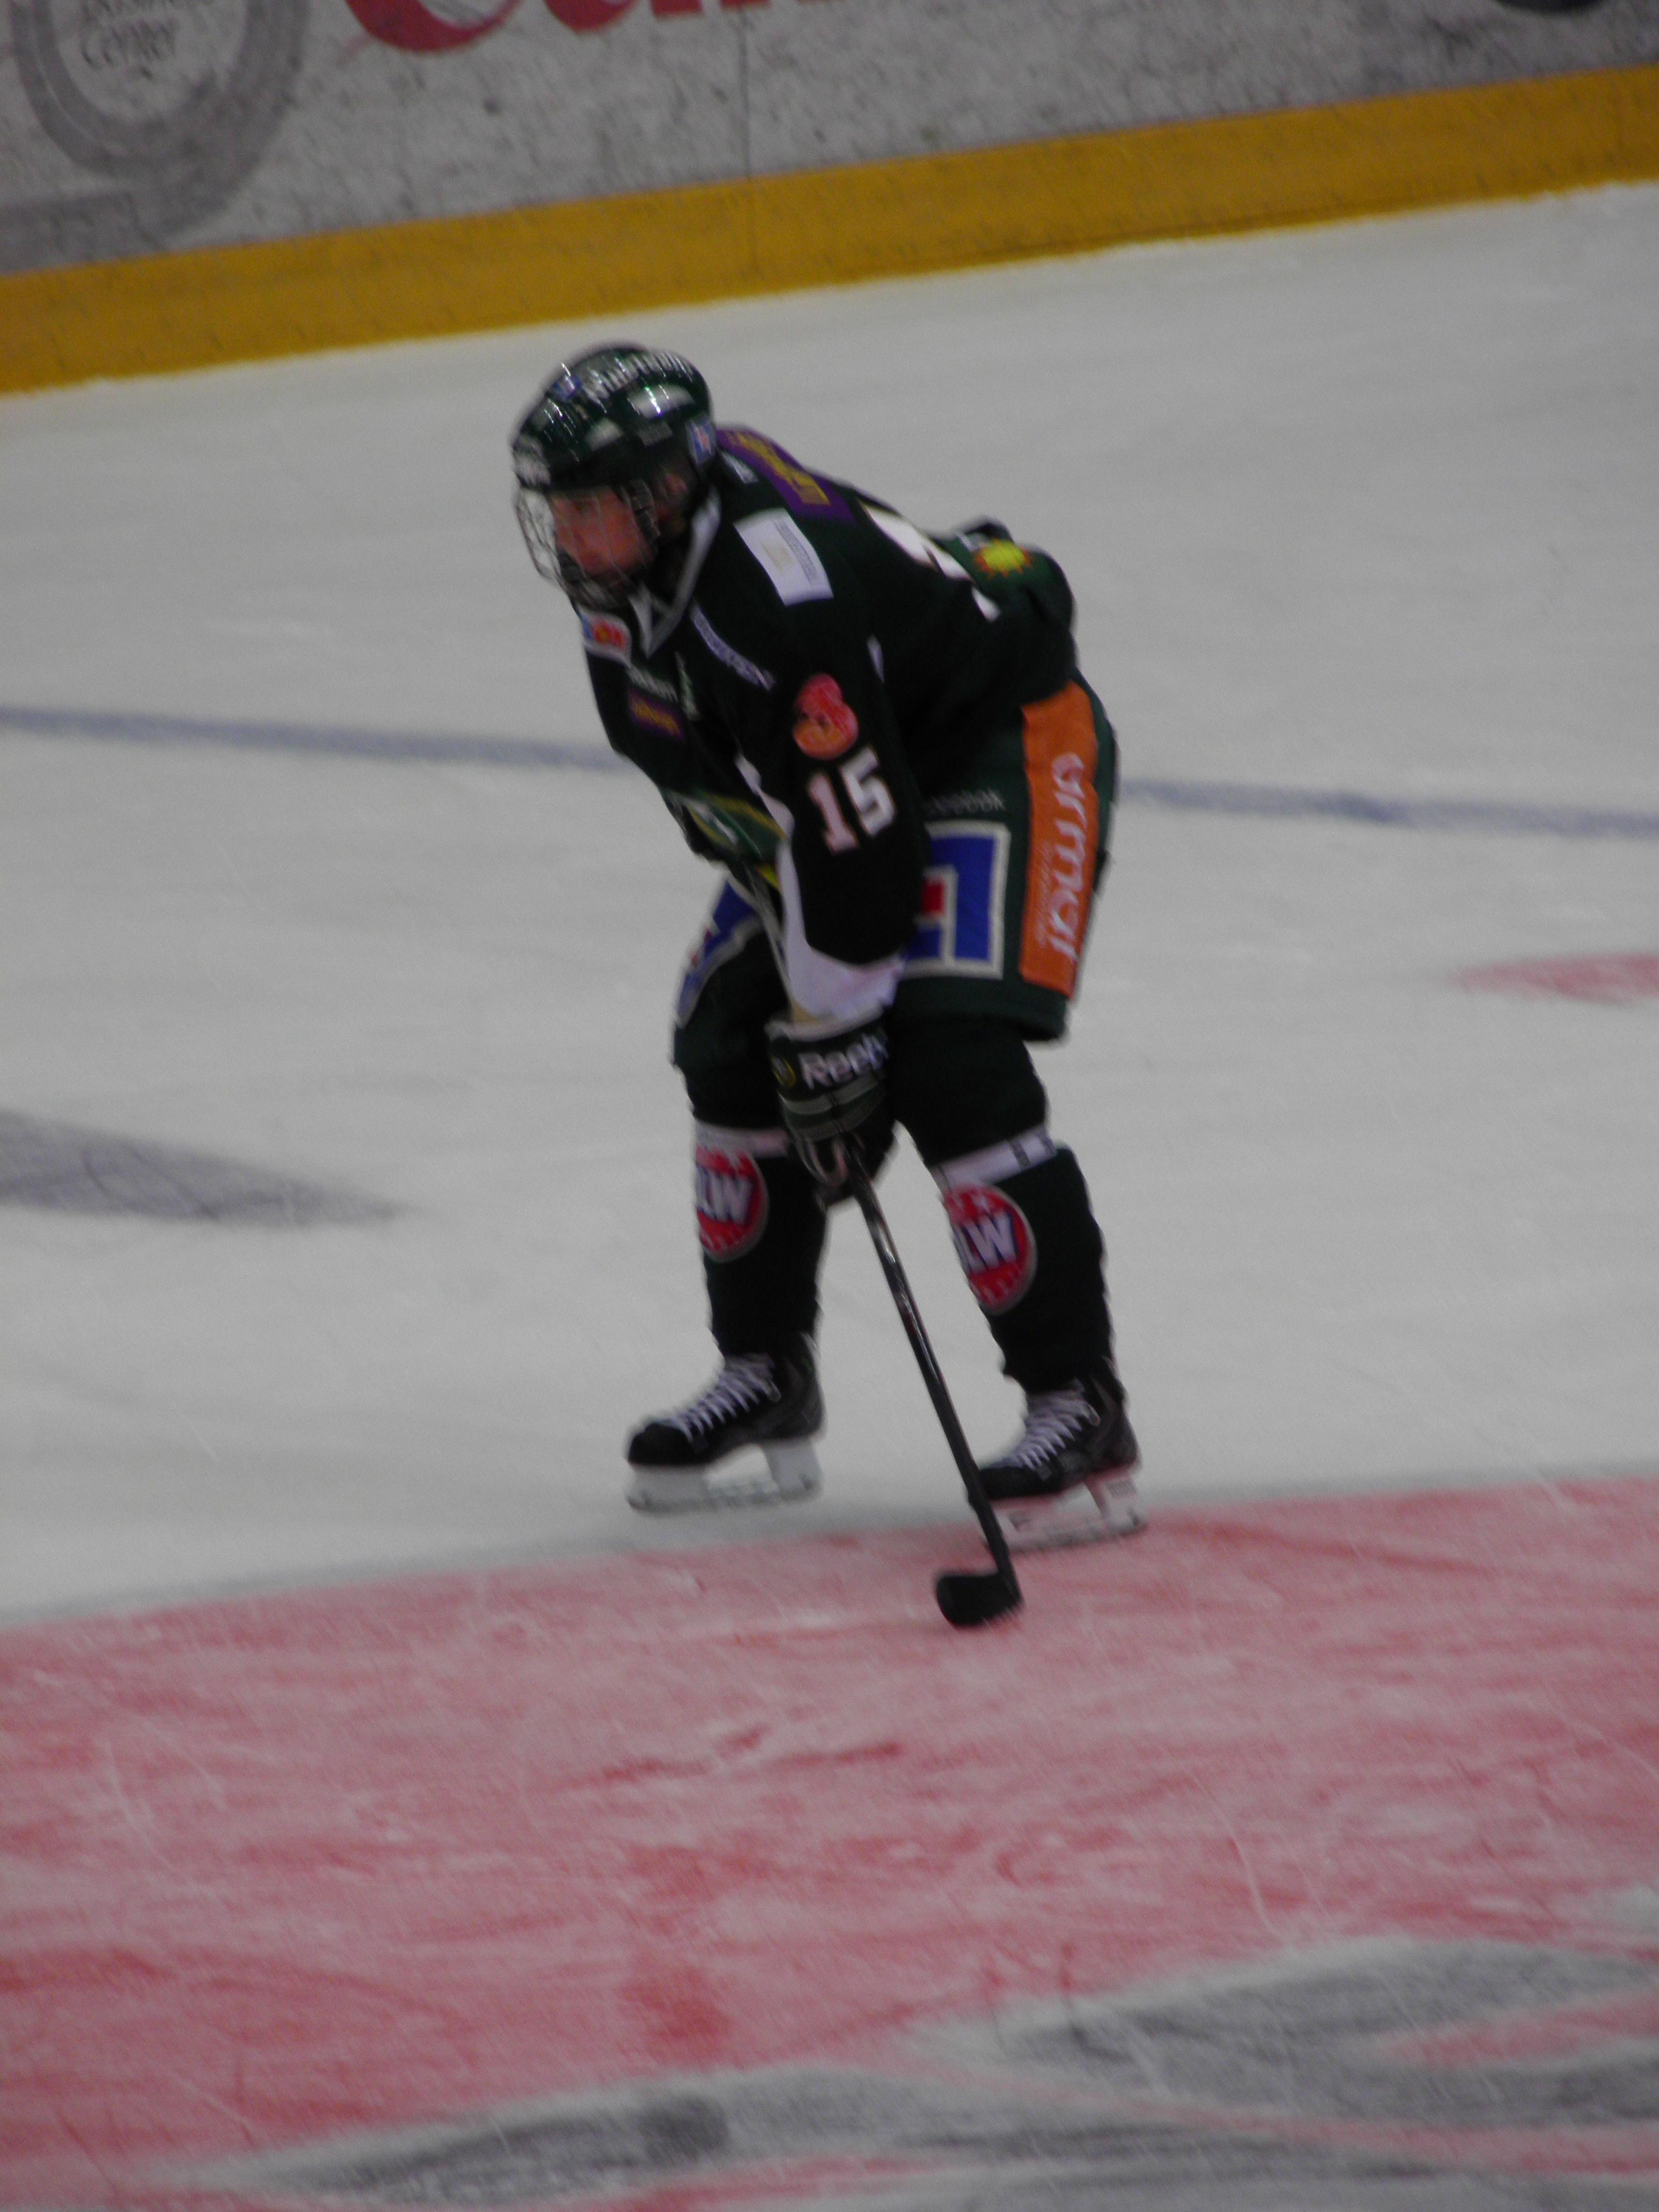 Wilhelm Westlund presenterade sig ordentligt i kvällens match Foto: Marie Angle/fbkbloggen